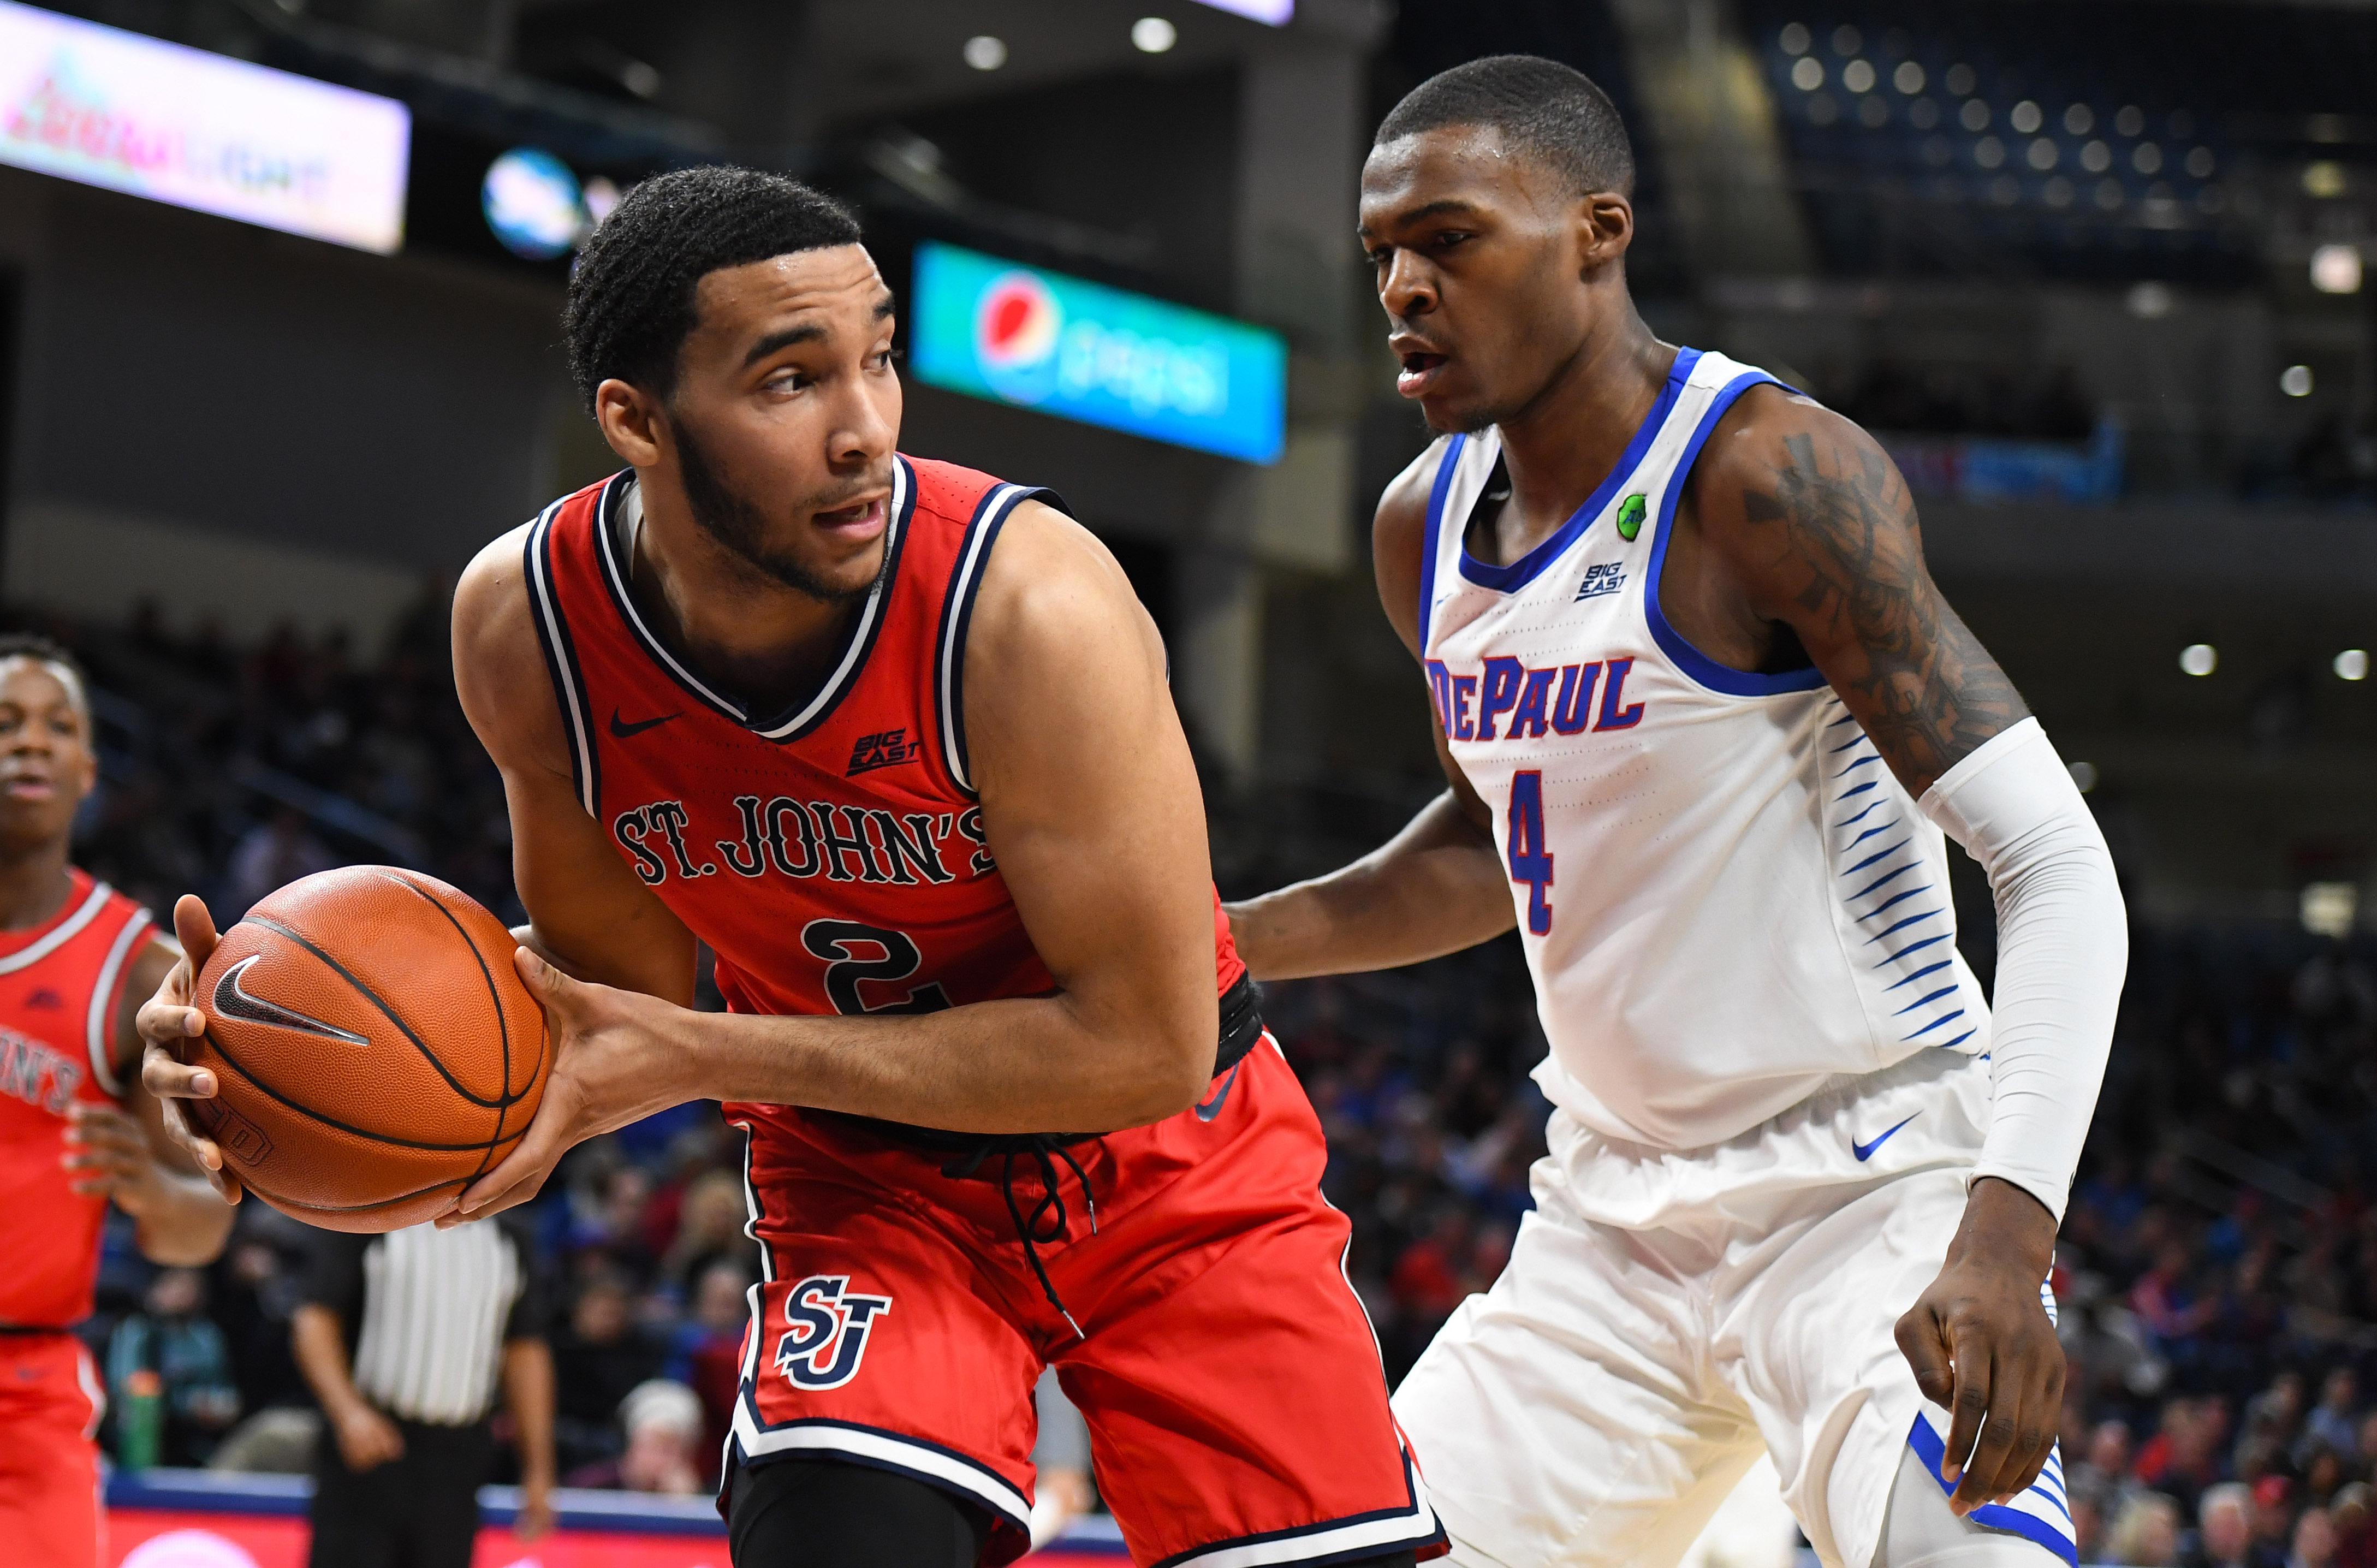 NCAA Basketball: St. John at DePaul